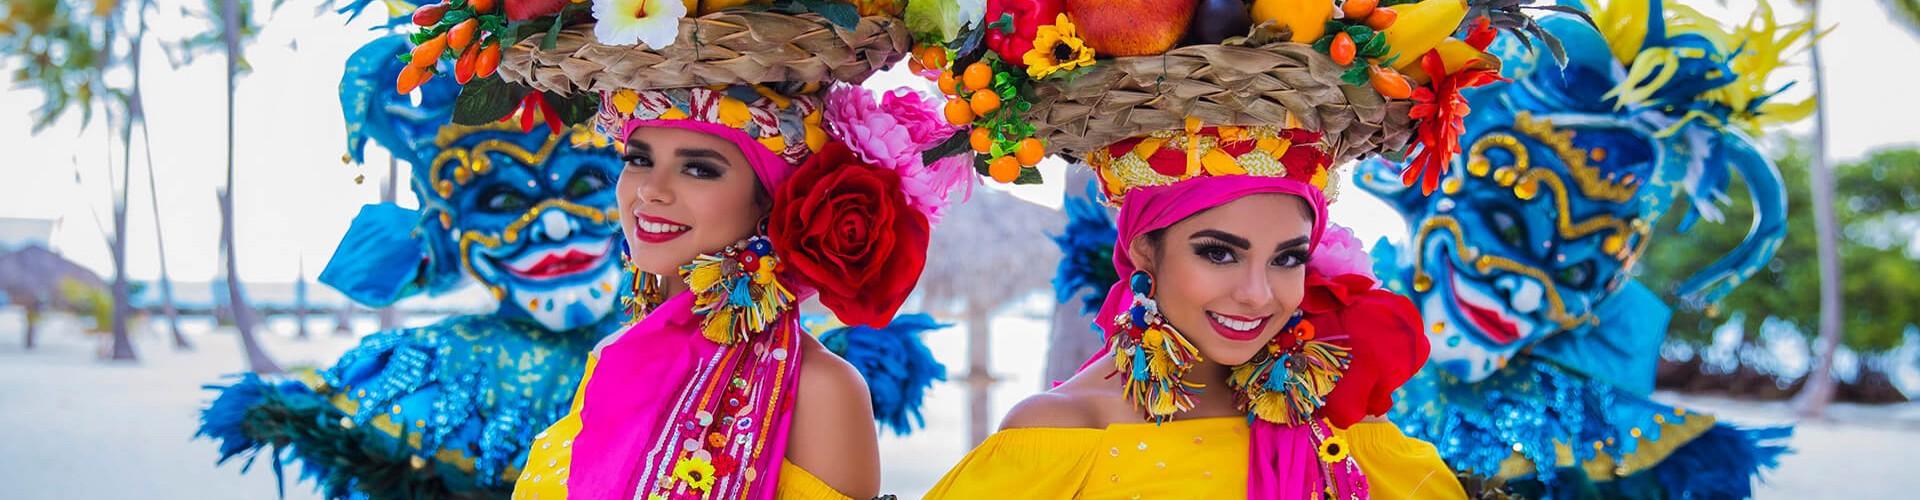 Carnaval in Dominican Republic